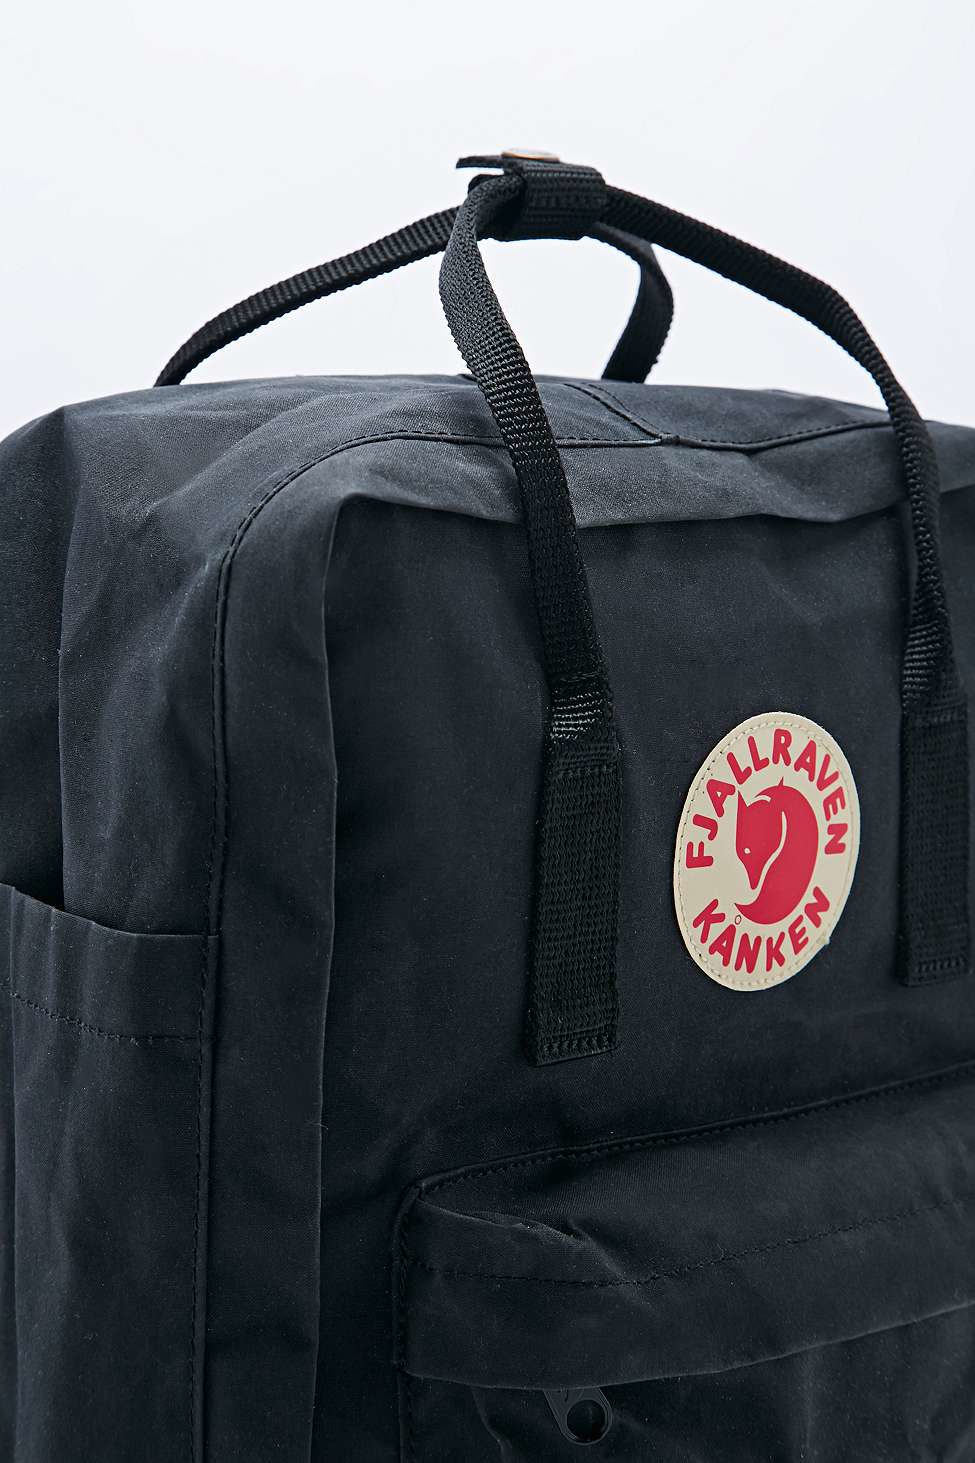 fjallraven kanken classic backpack black